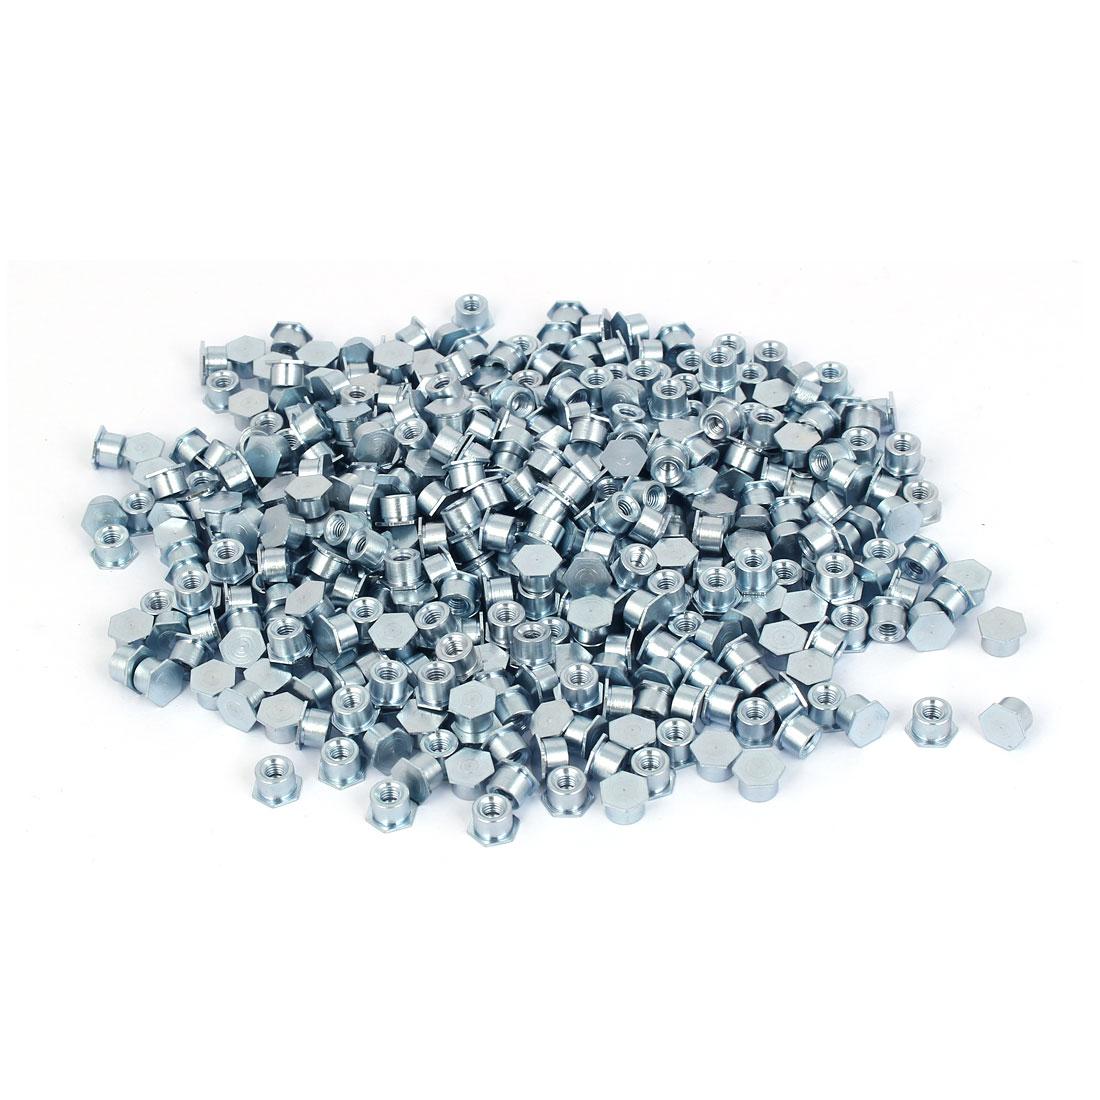 Carbon Steel Zinc Plated Hex Head Full Thread Self Clinching Standoff Silver Blue M3x4mm 500pcs